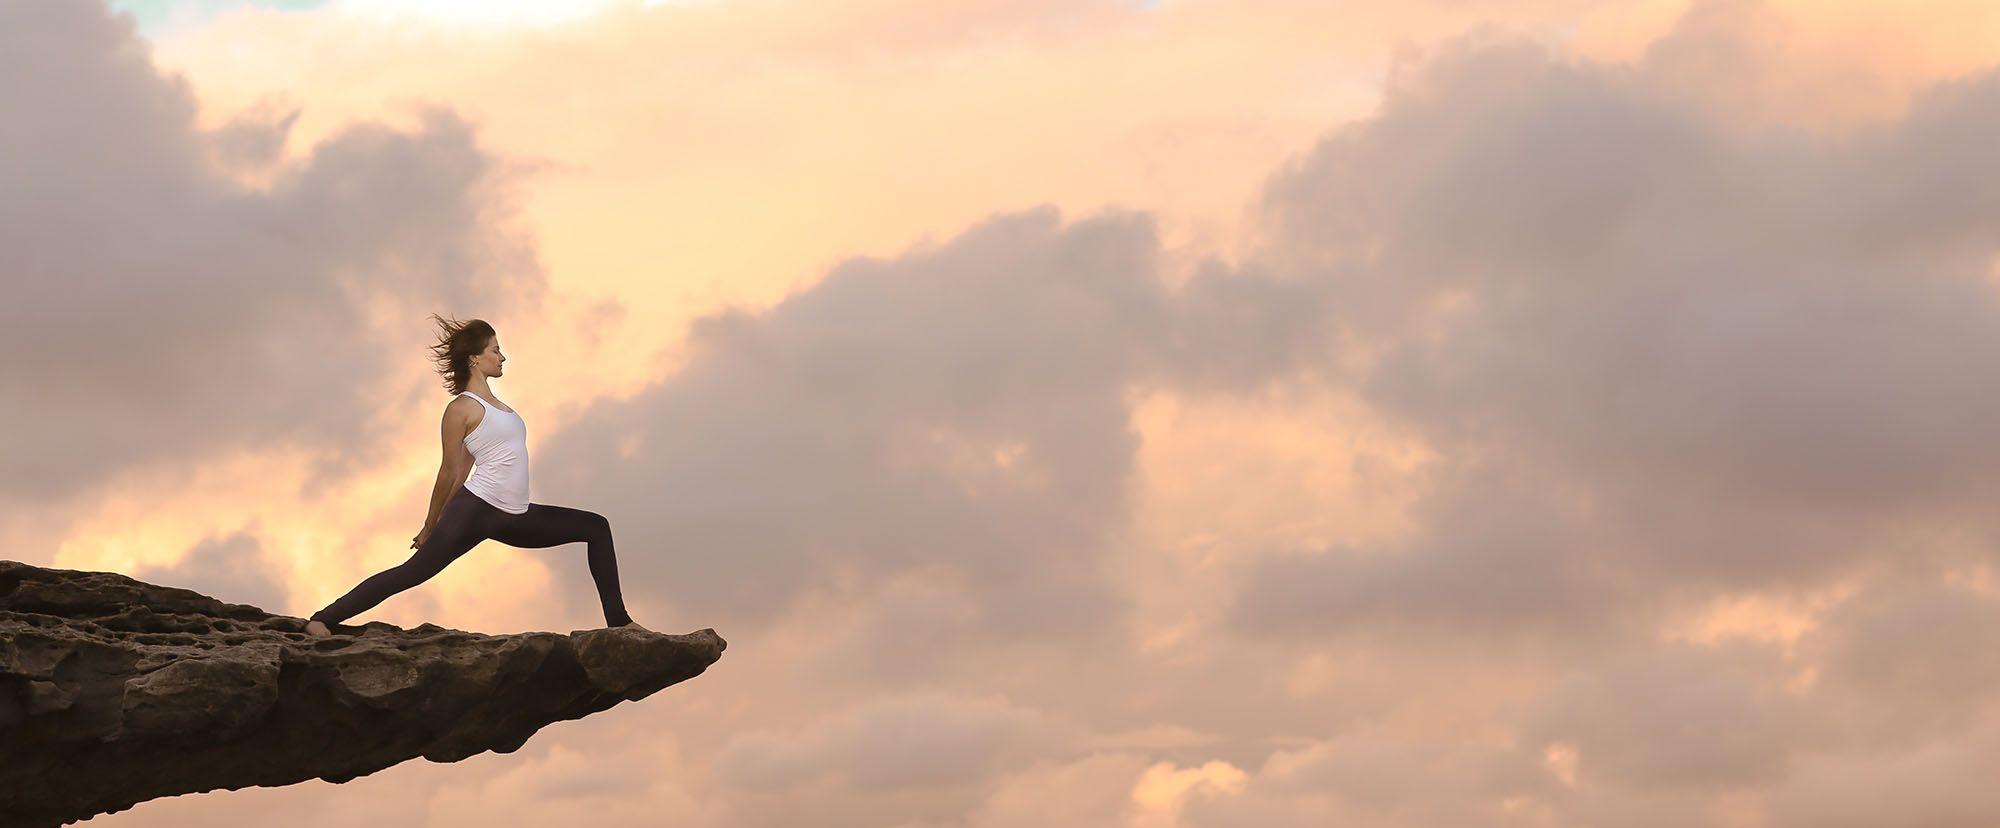 Hero Image Plan your Yoga Journey